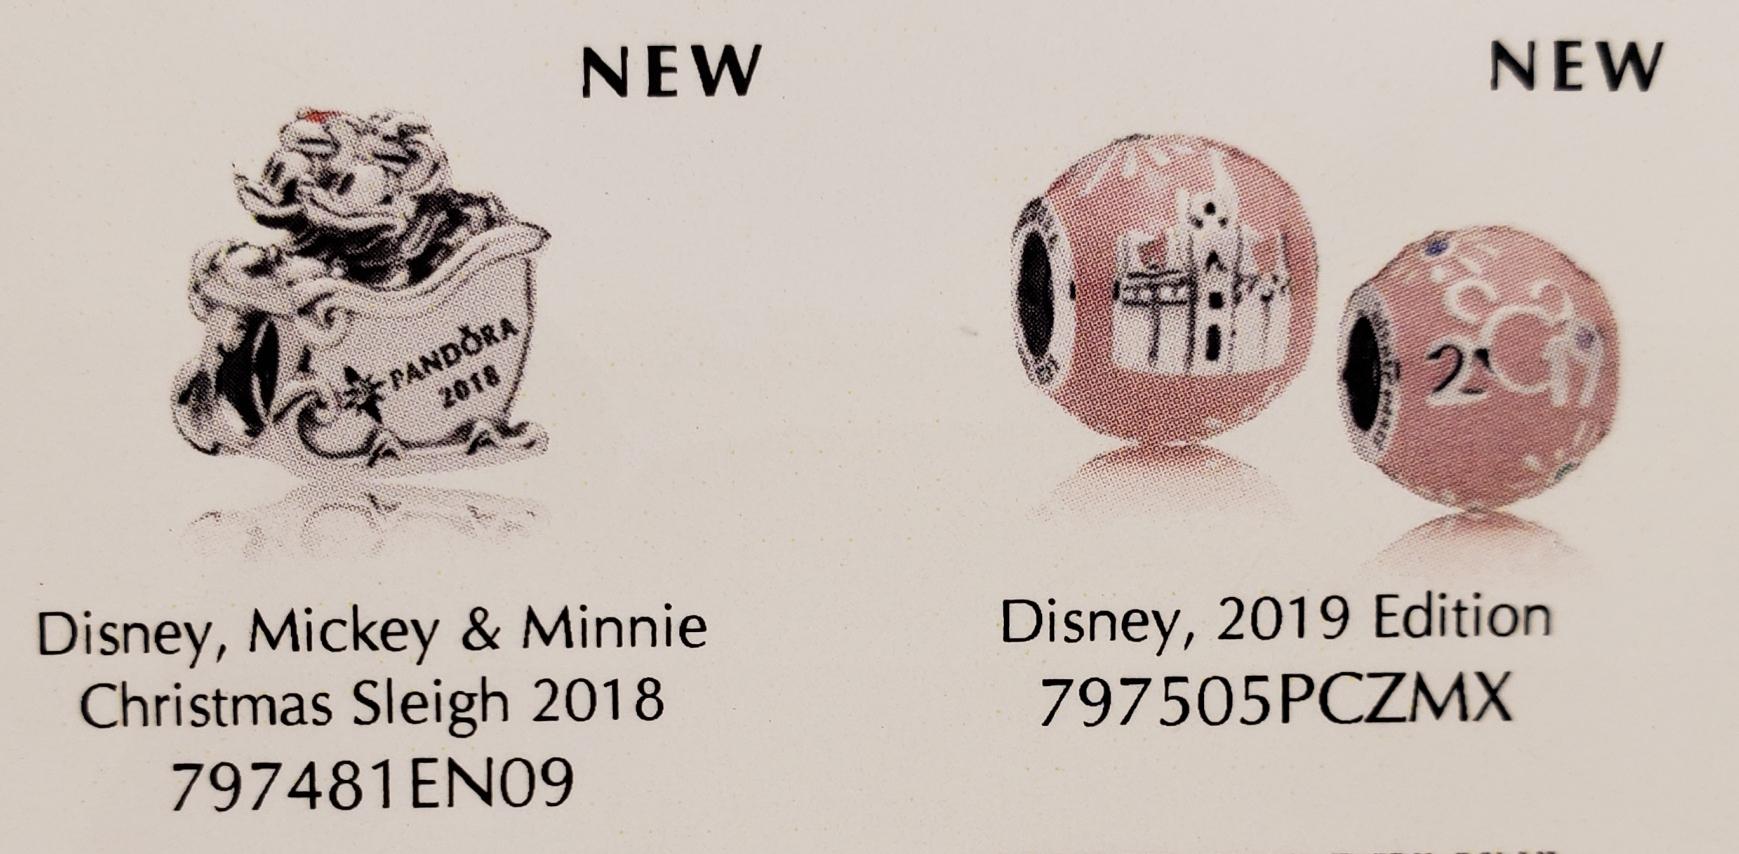 Park Exclusive Disney Pandora Charms